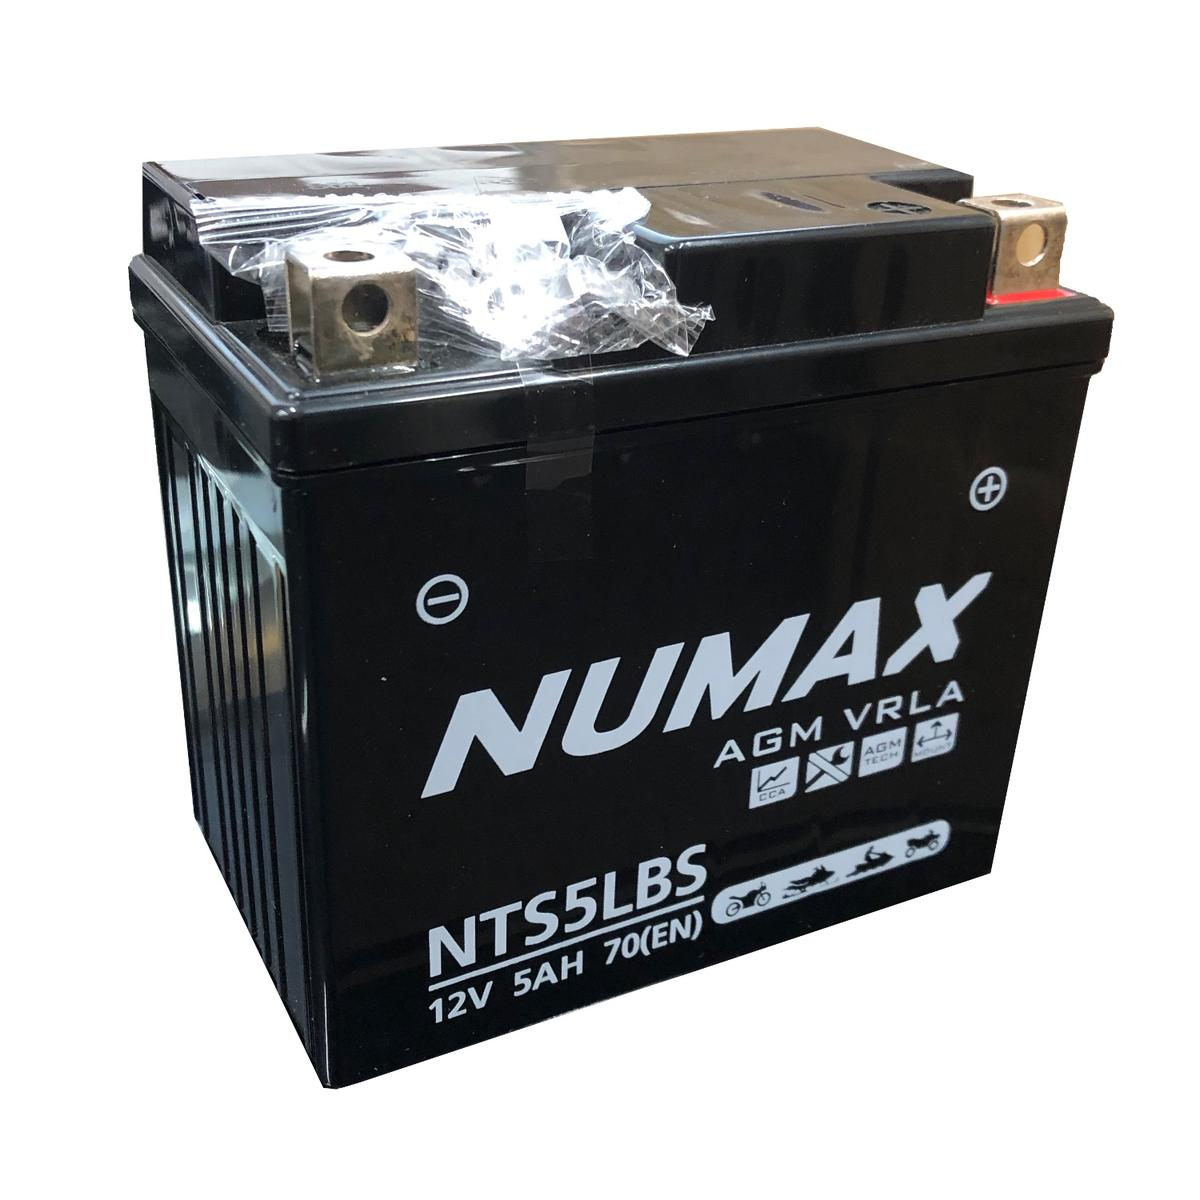 Numax NTS5LBS KTM 450 MXC Racing Motorbike Battery NEW